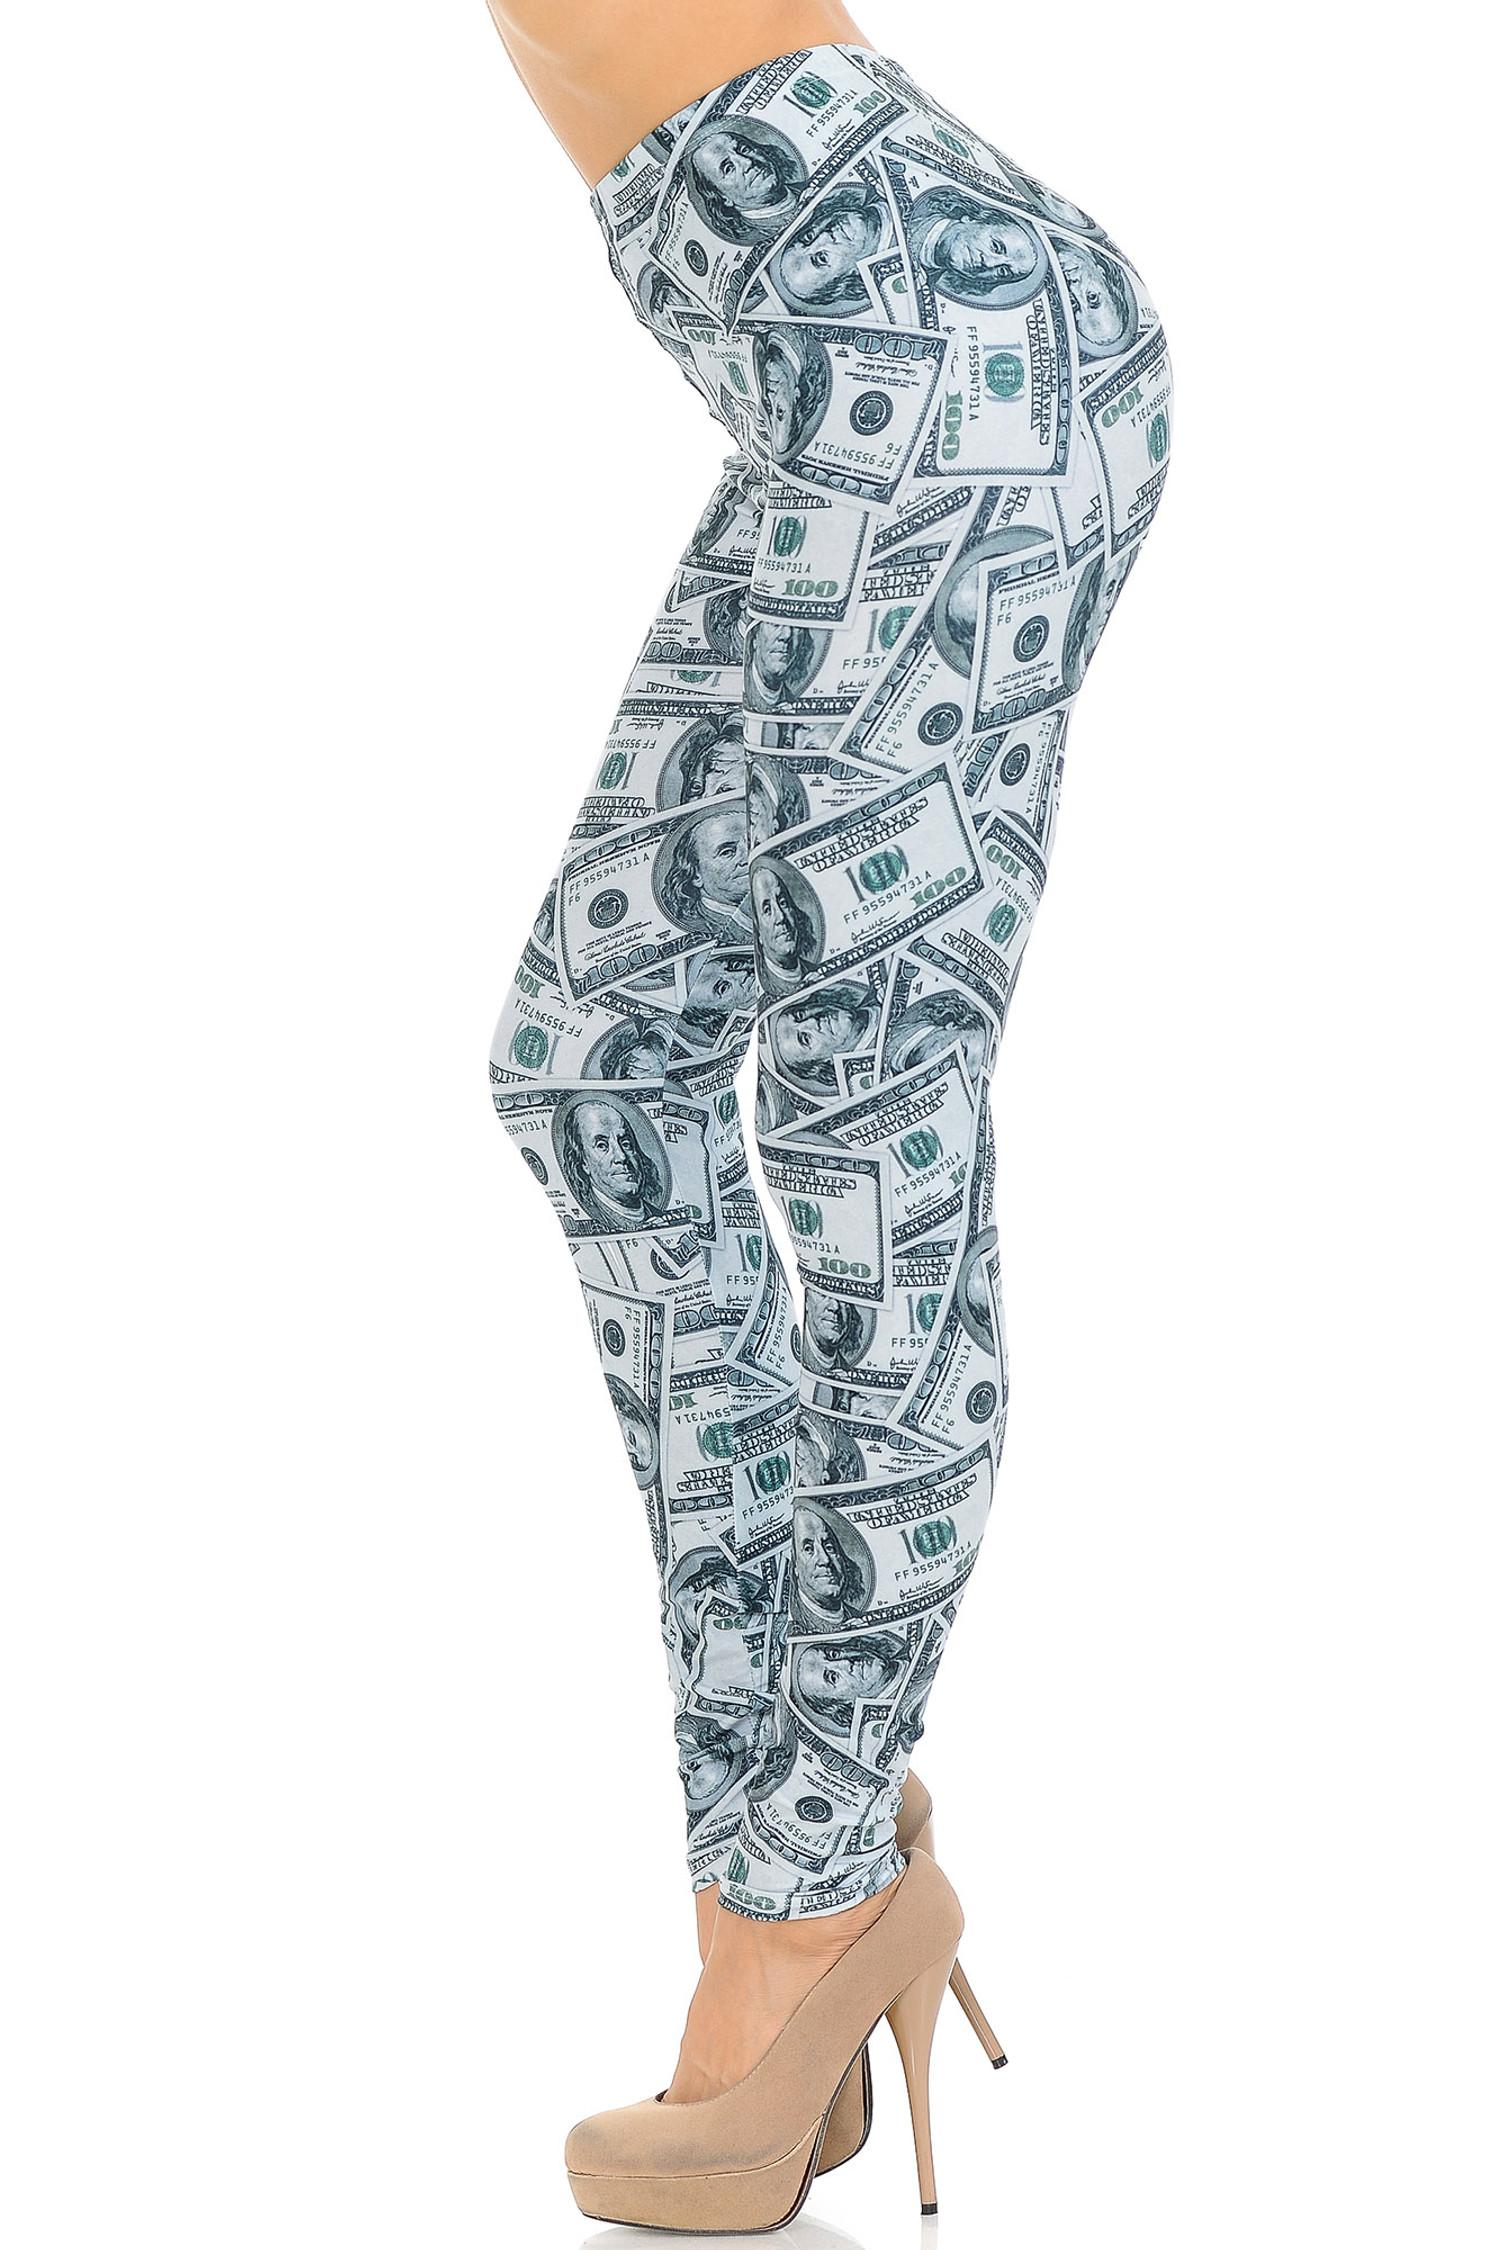 Creamy Soft Raining Money Leggings - USA Fashion™